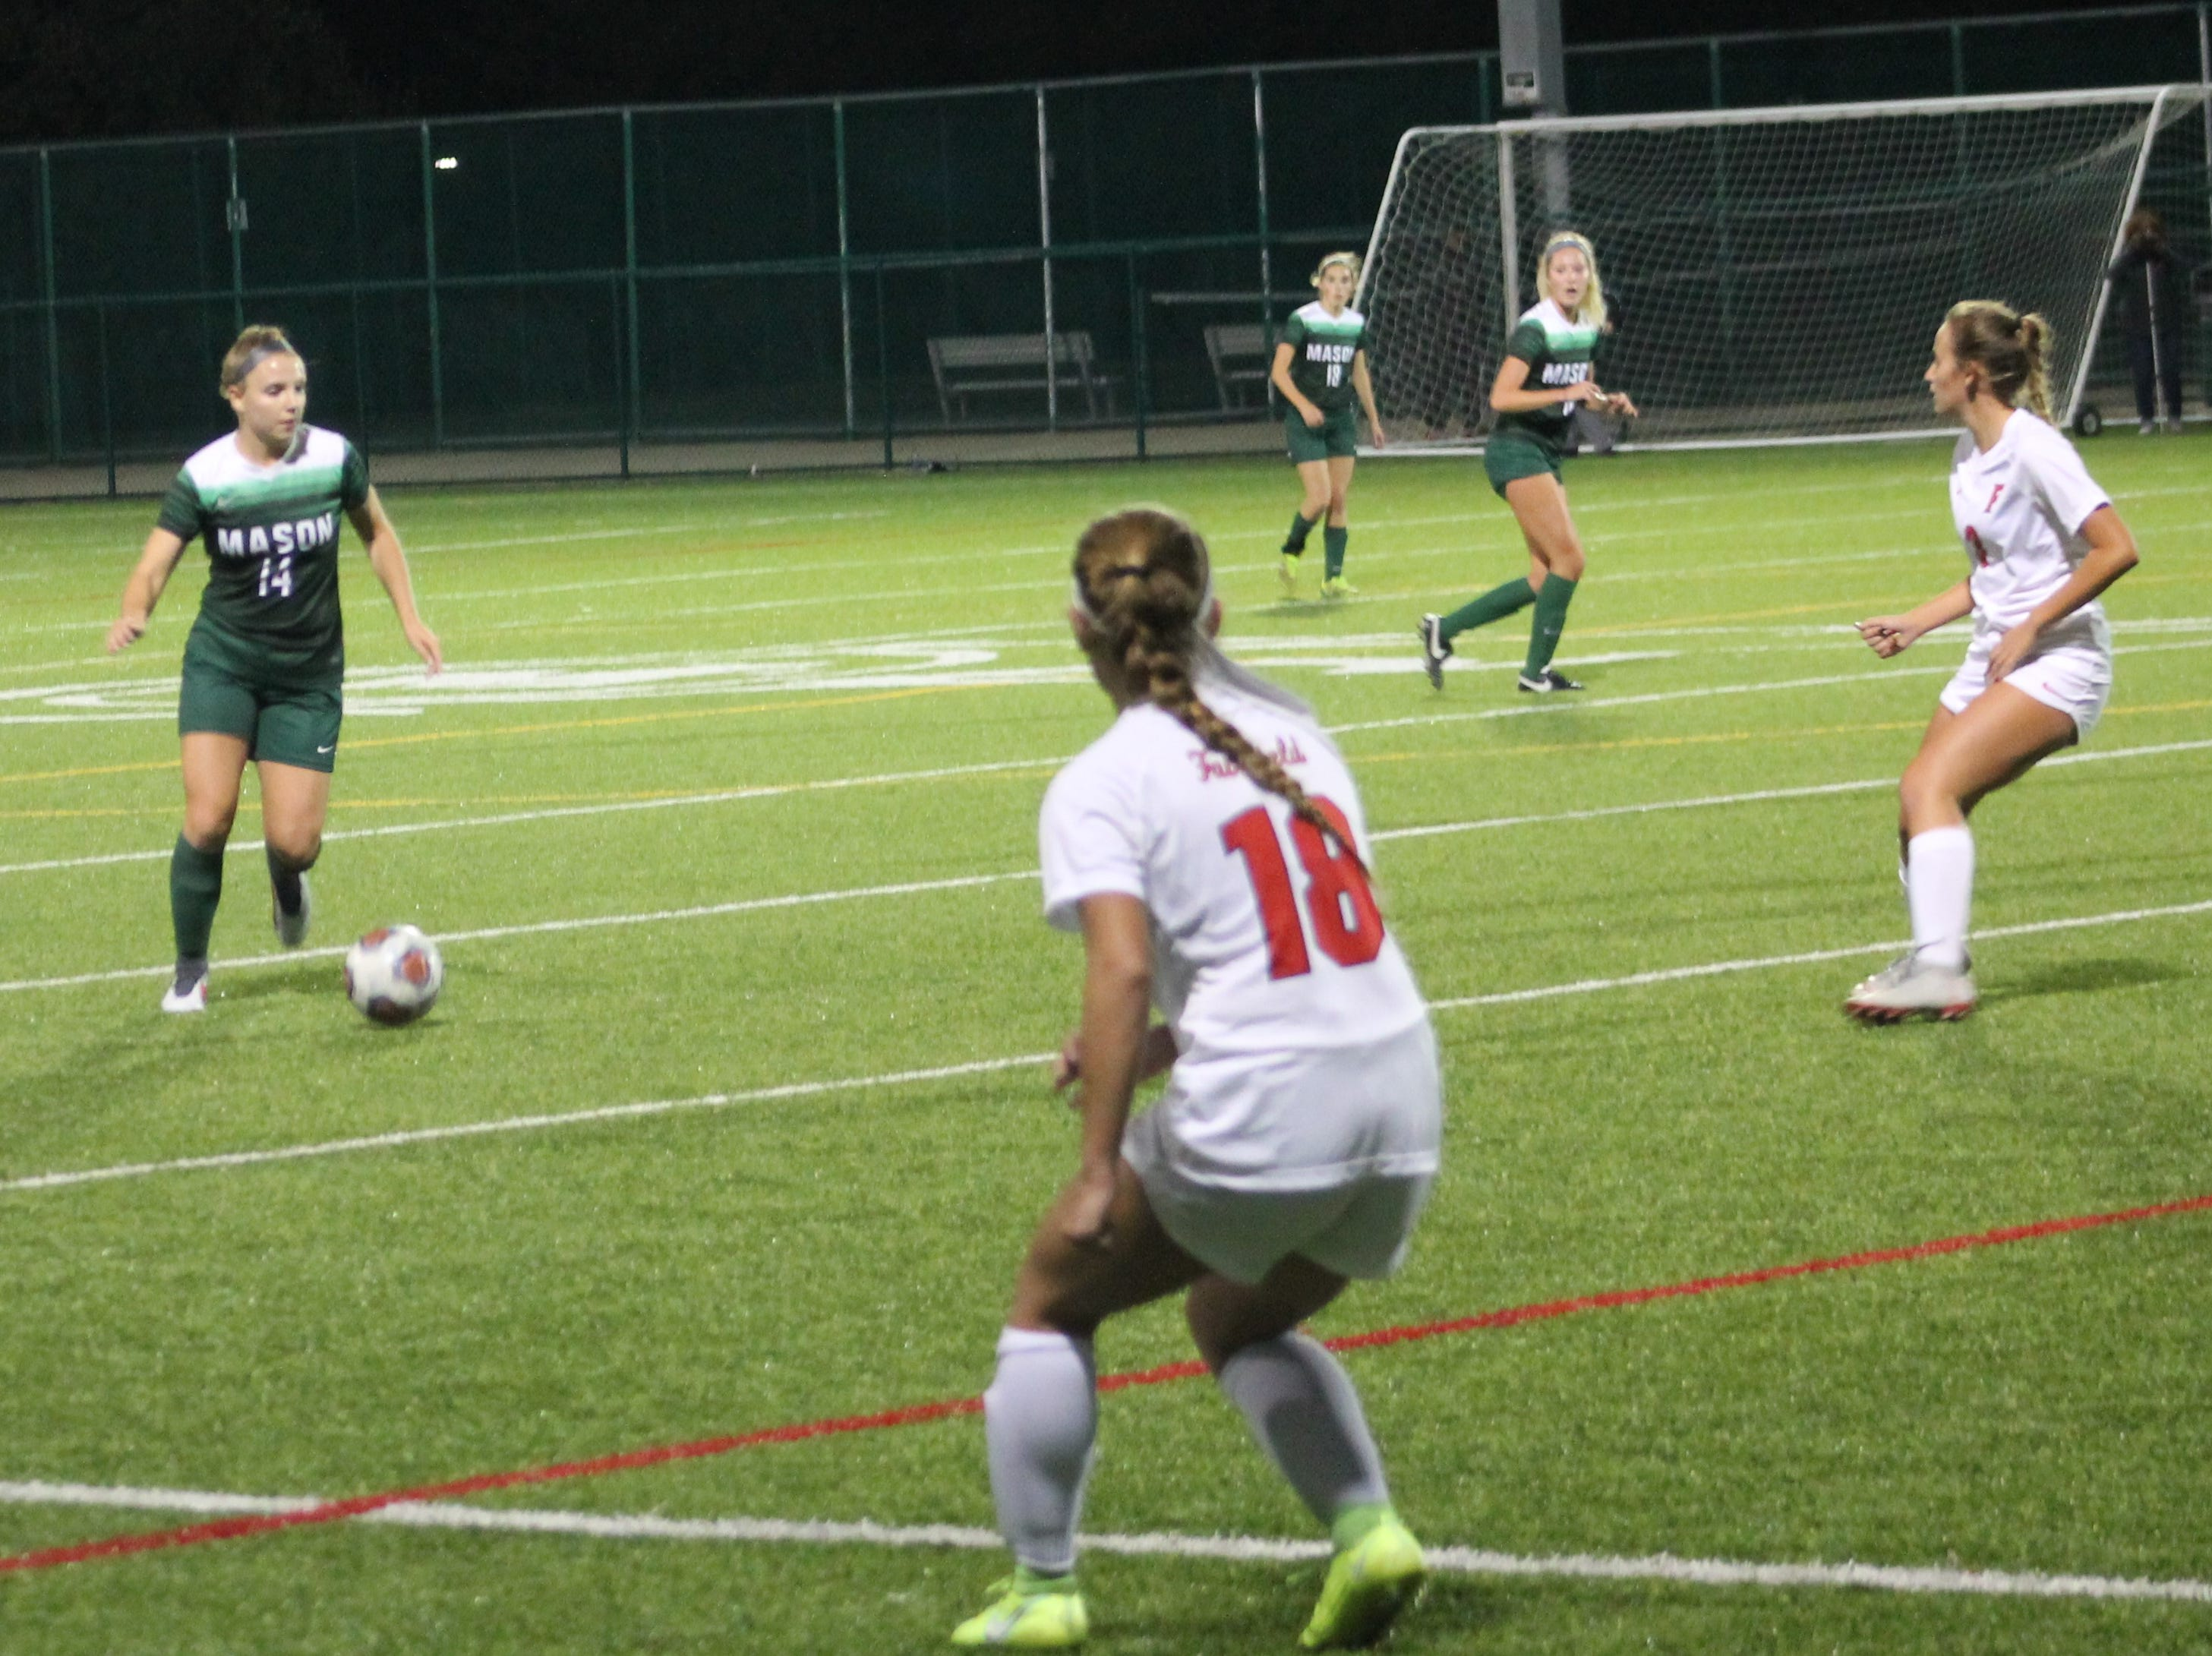 Mason senior midfielder Olivia Polnow has Fairfield back on their heels